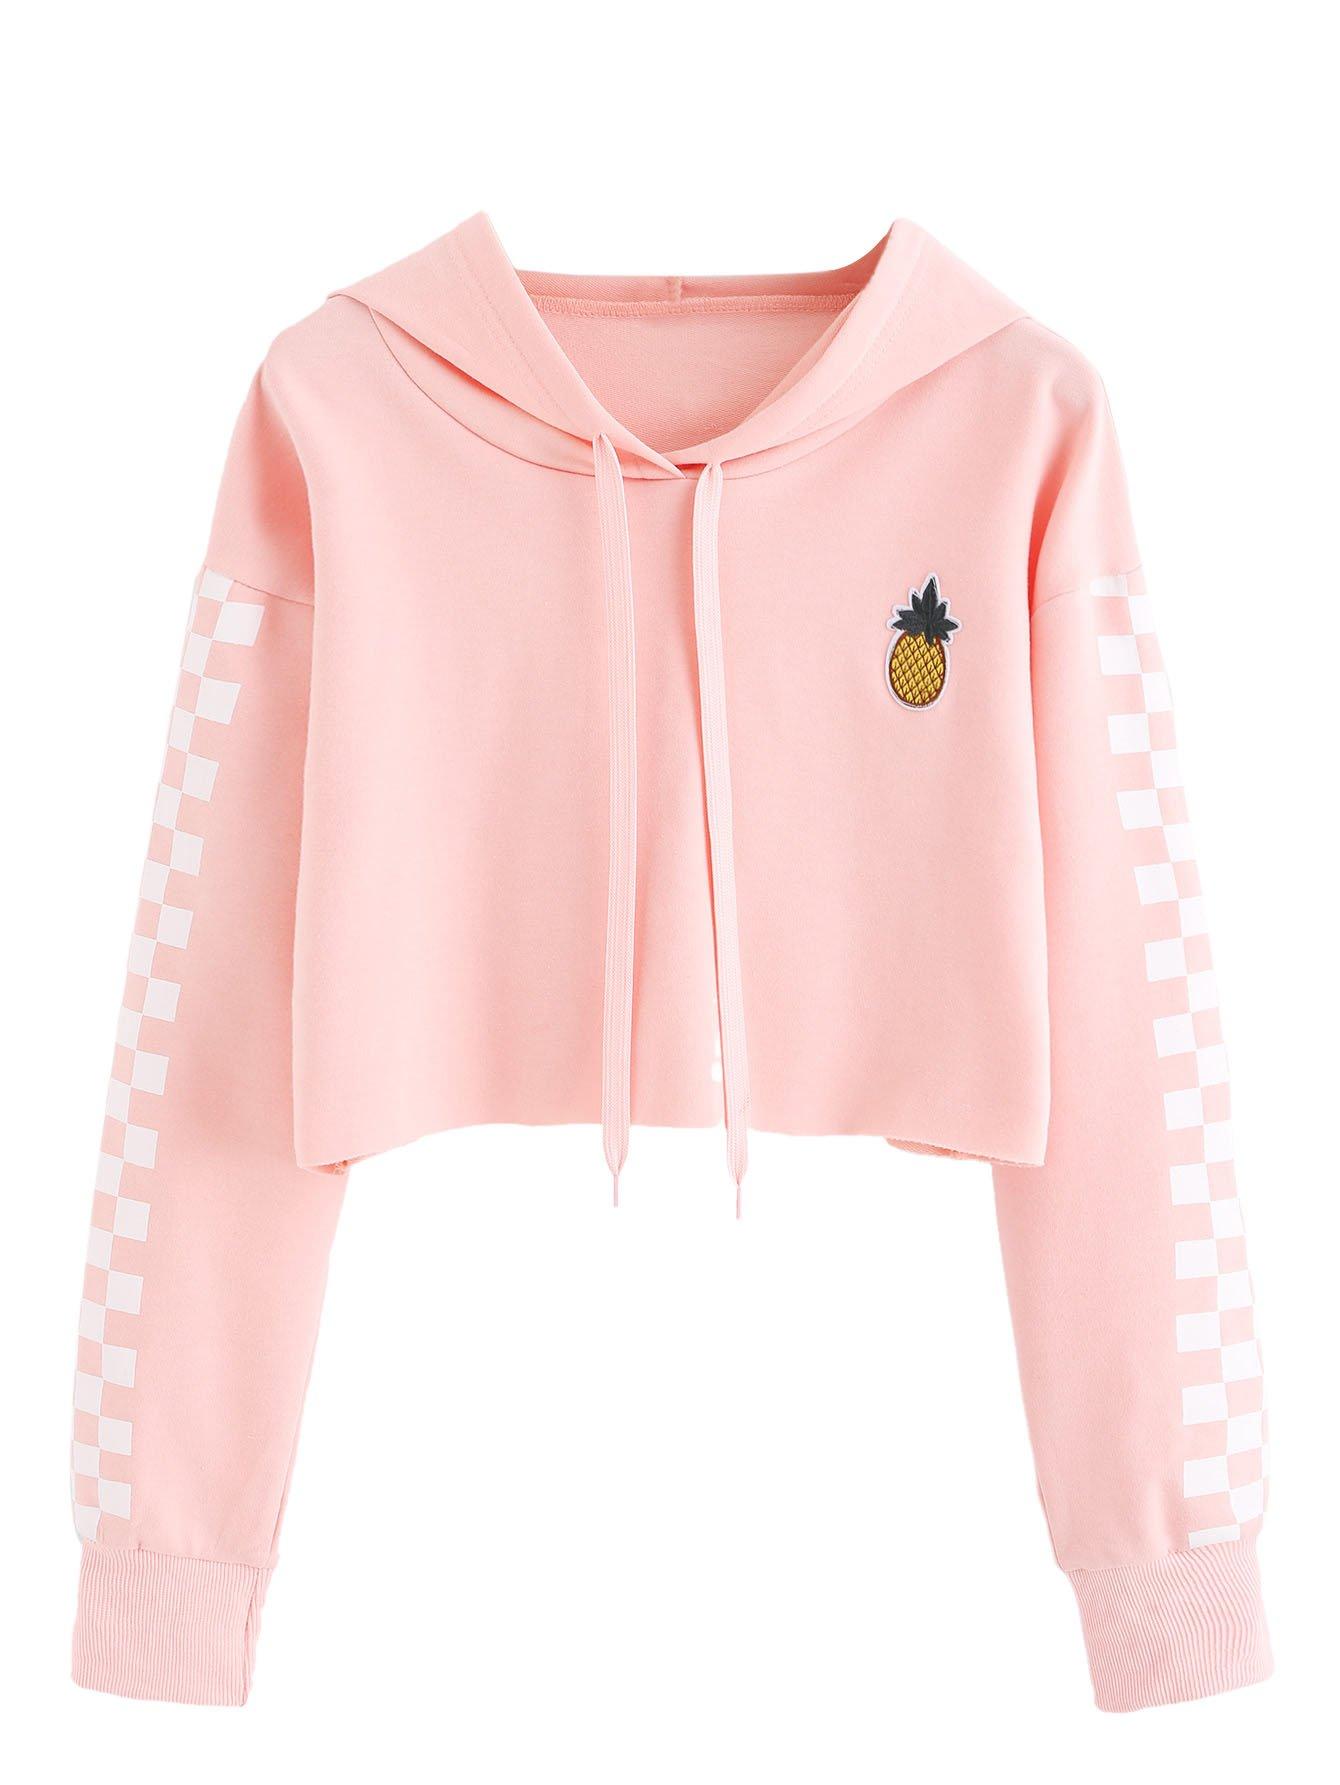 MakeMeChic Women's Pineapple Embroidered Hoodie Plaid Crop Top Sweatshirt Pink S